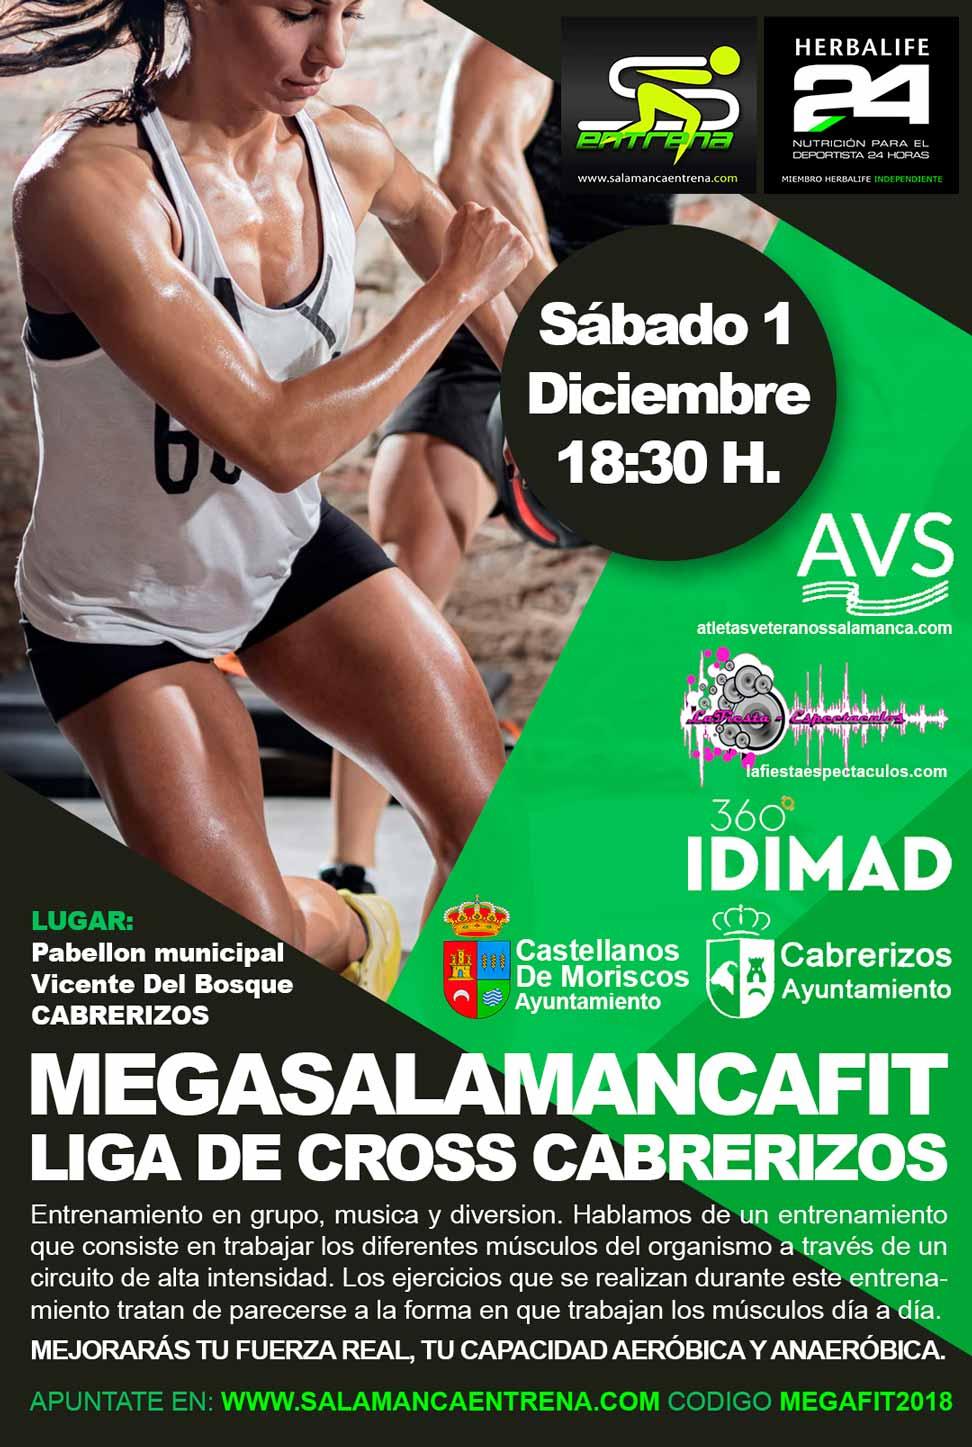 salamancafit-liga-cross-cabrerizos 2018